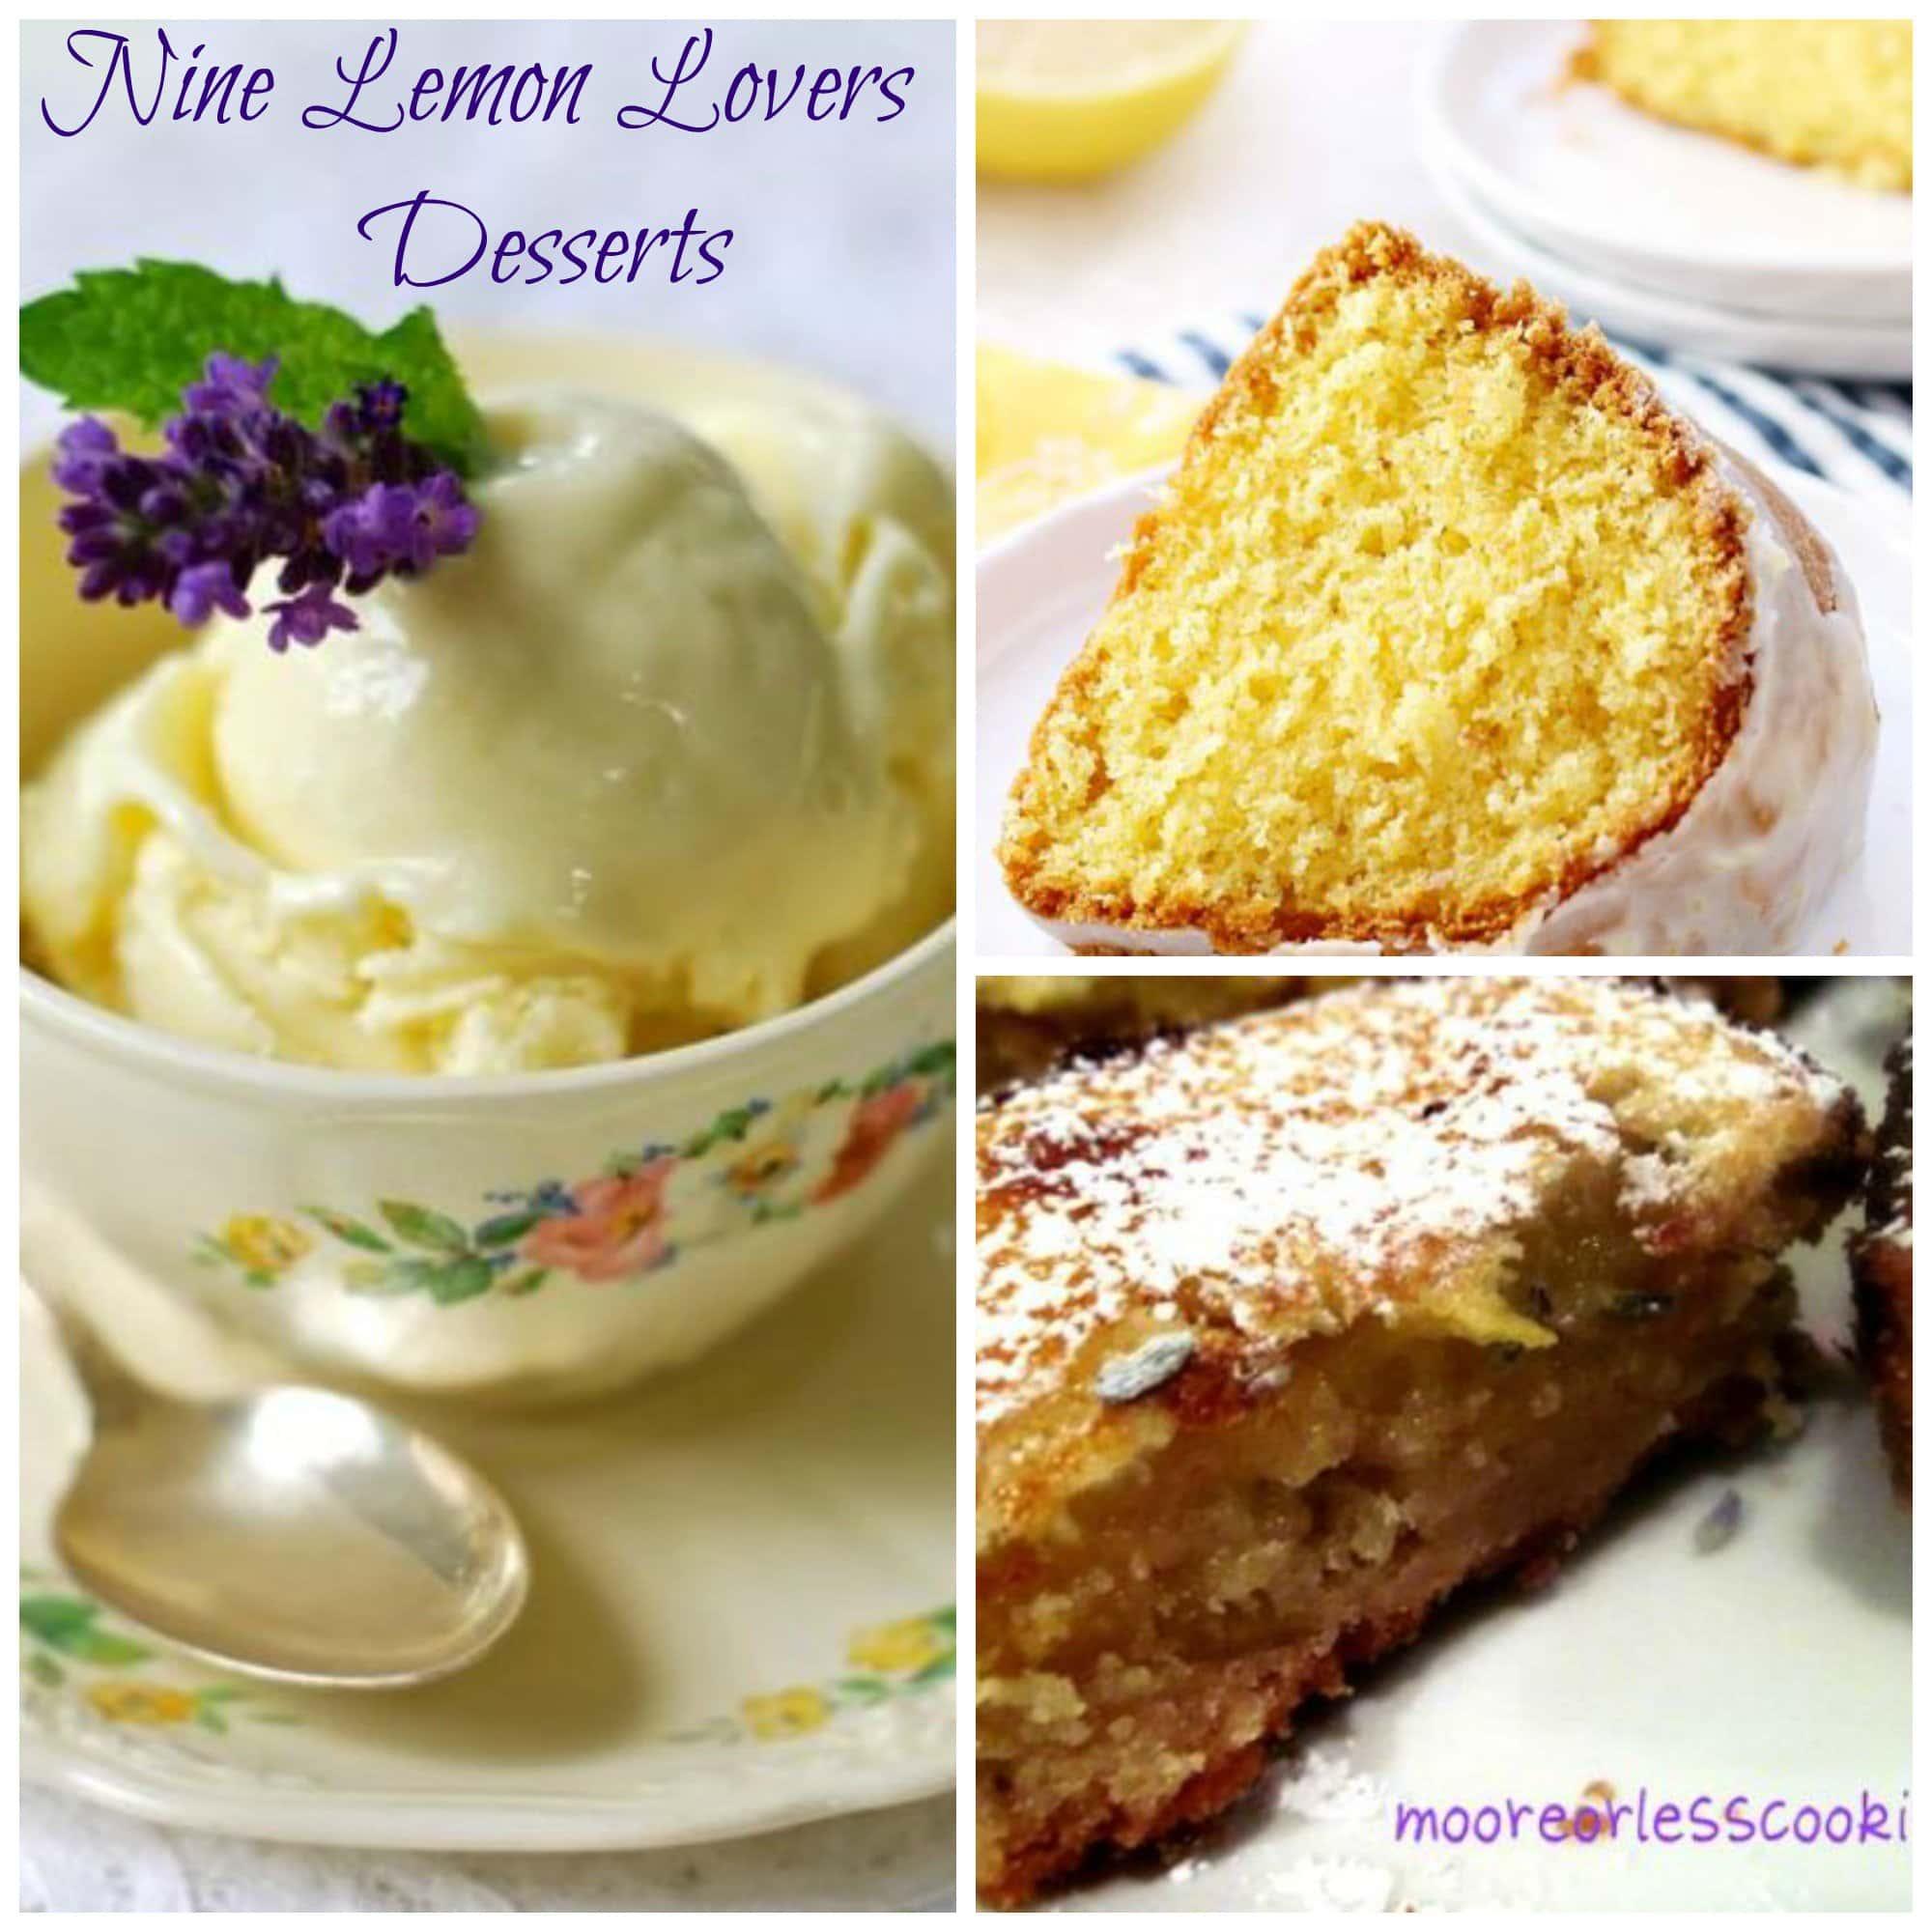 9 Desserts Just for Lemon Lovers